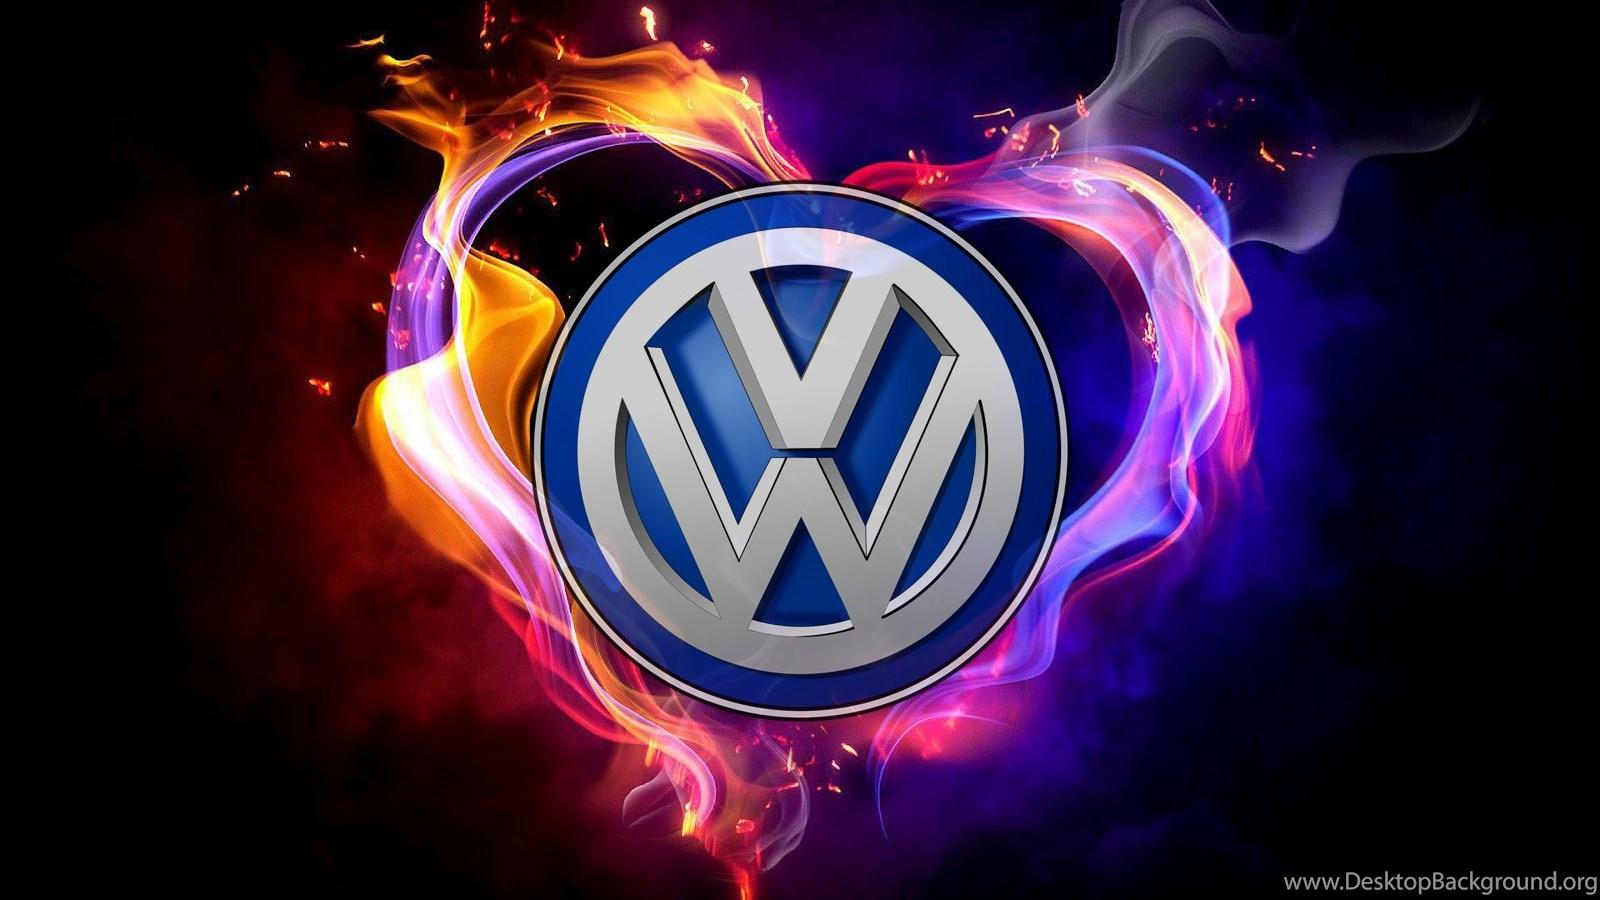 Fondo De Pantalla Del Logo De Volkswagen 4k Vw Logo Fondo De Pantalla 1600x900 Wallpapertip